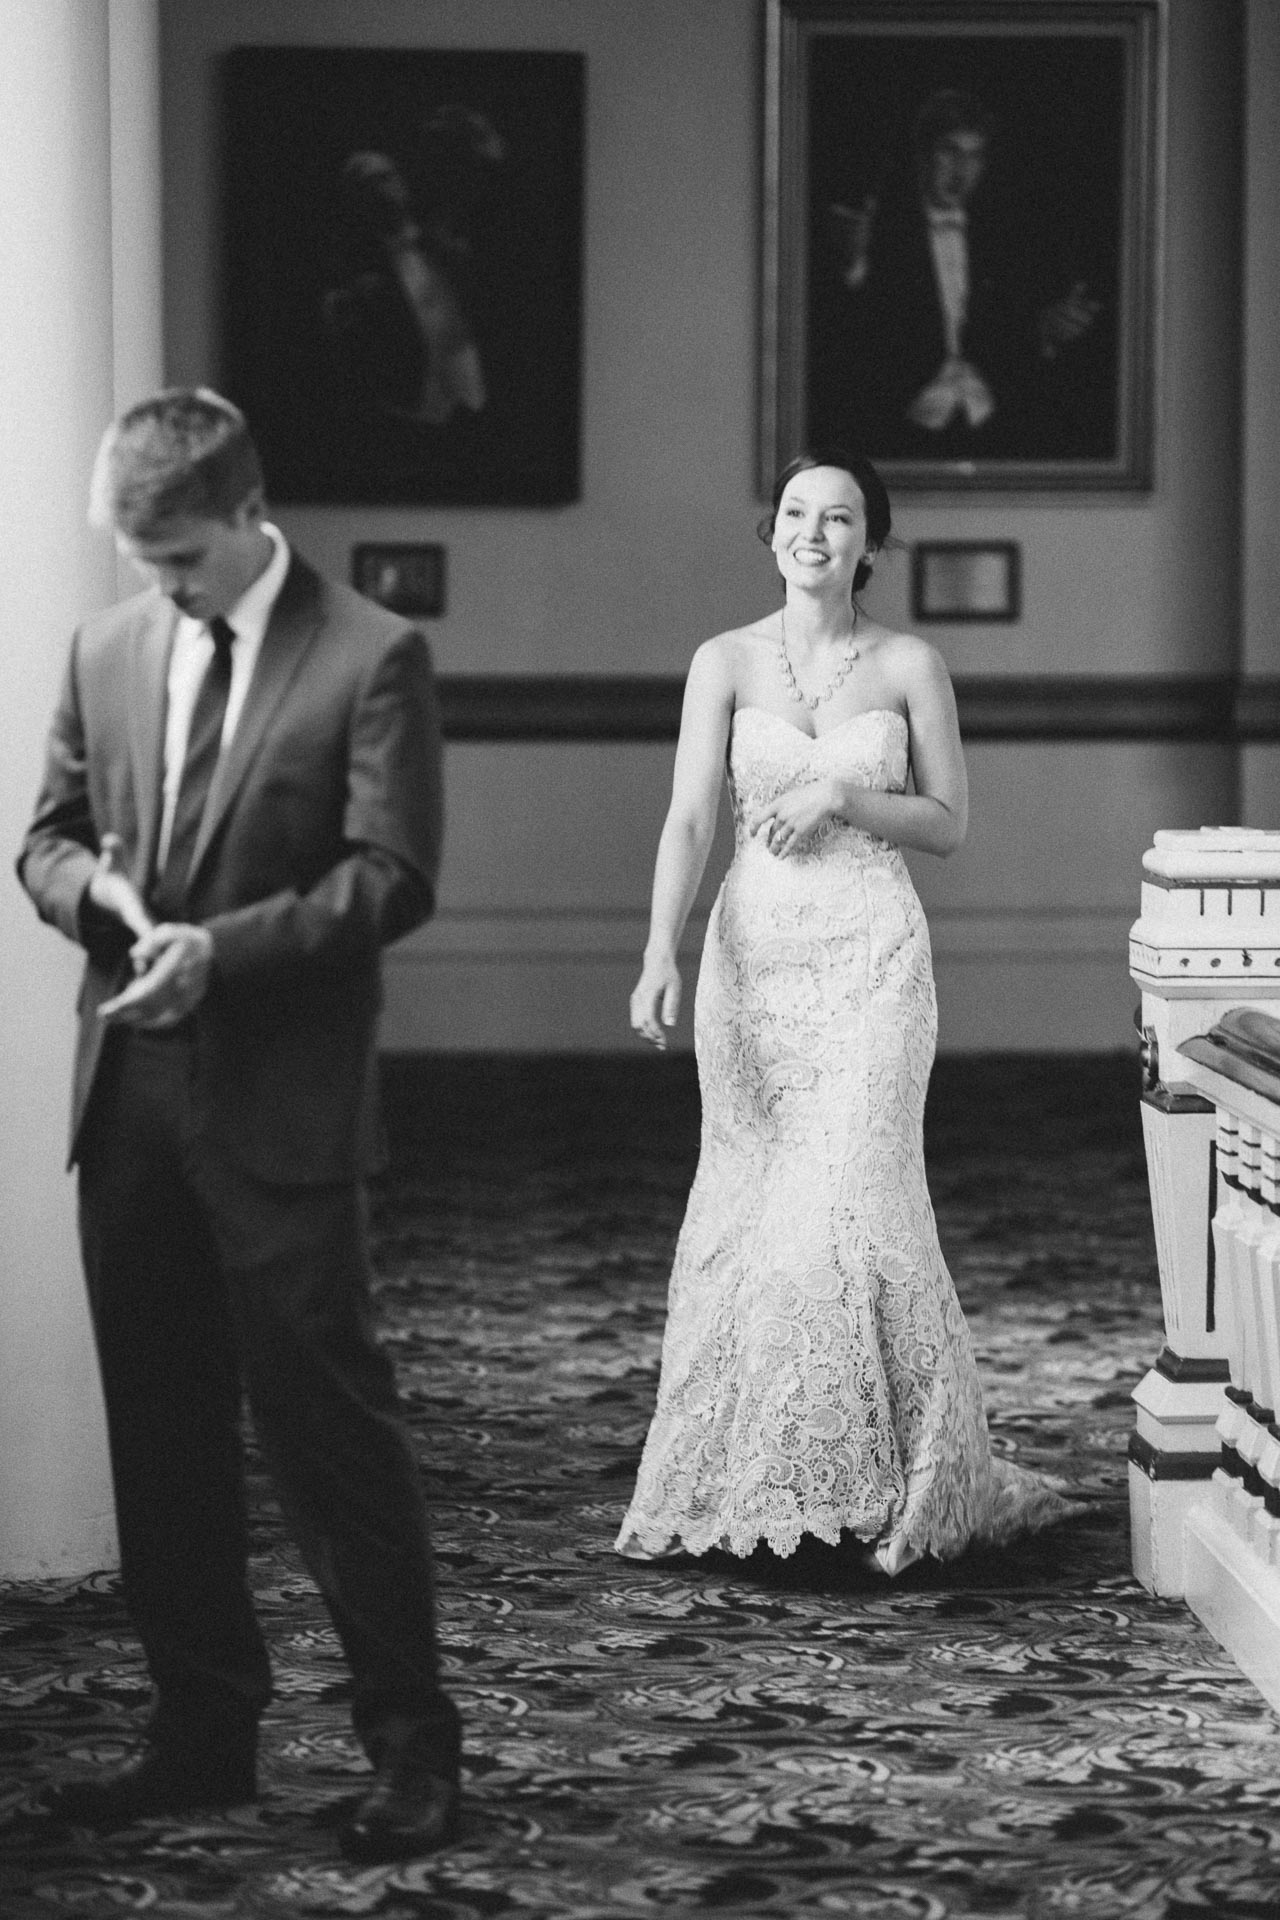 Julia-Michael-Cincinnati-Music-Hall-Wedding-044@2x.jpg